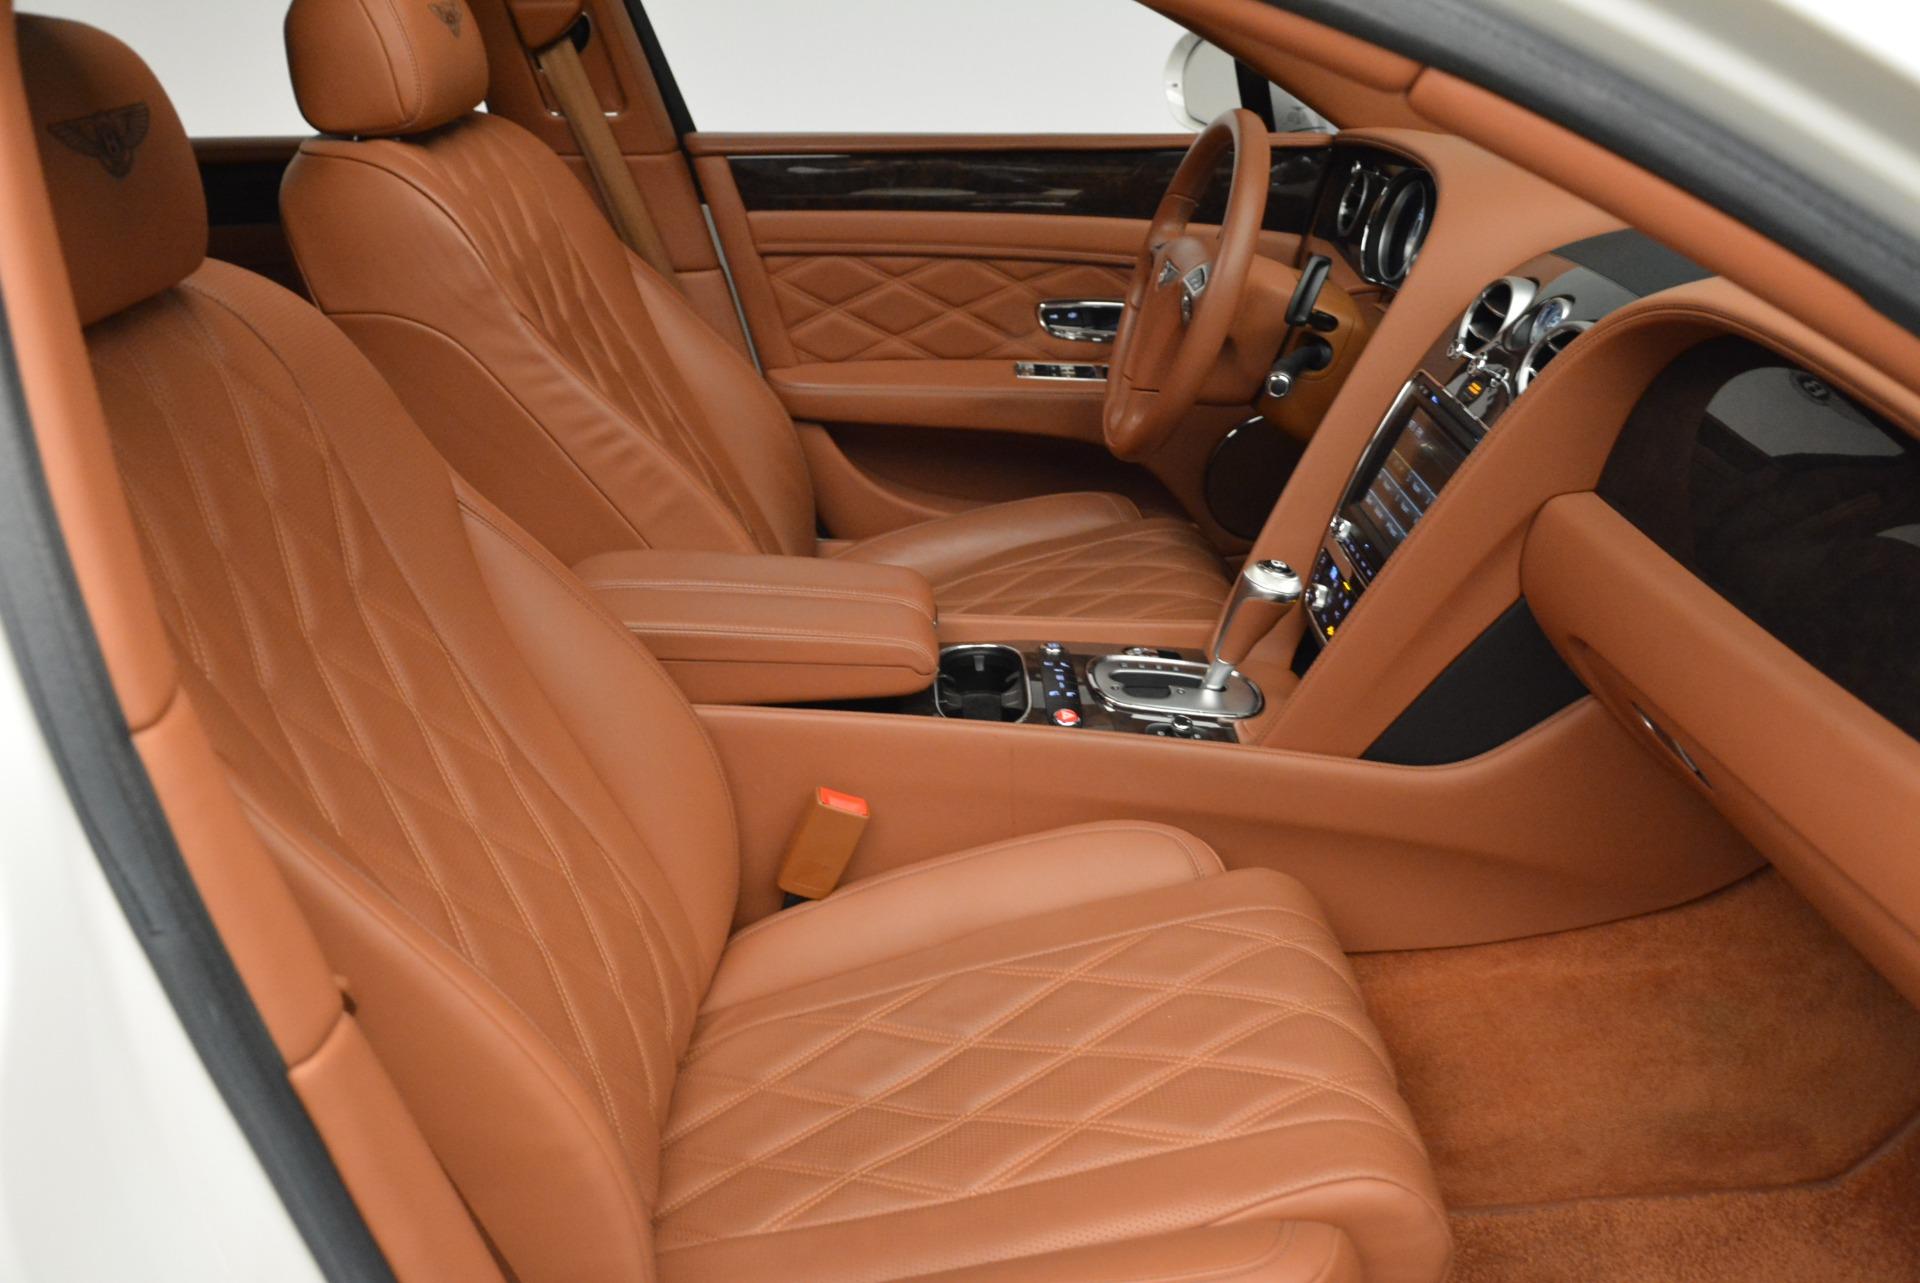 Used 2014 Bentley Flying Spur W12 For Sale In Westport, CT 1906_p33